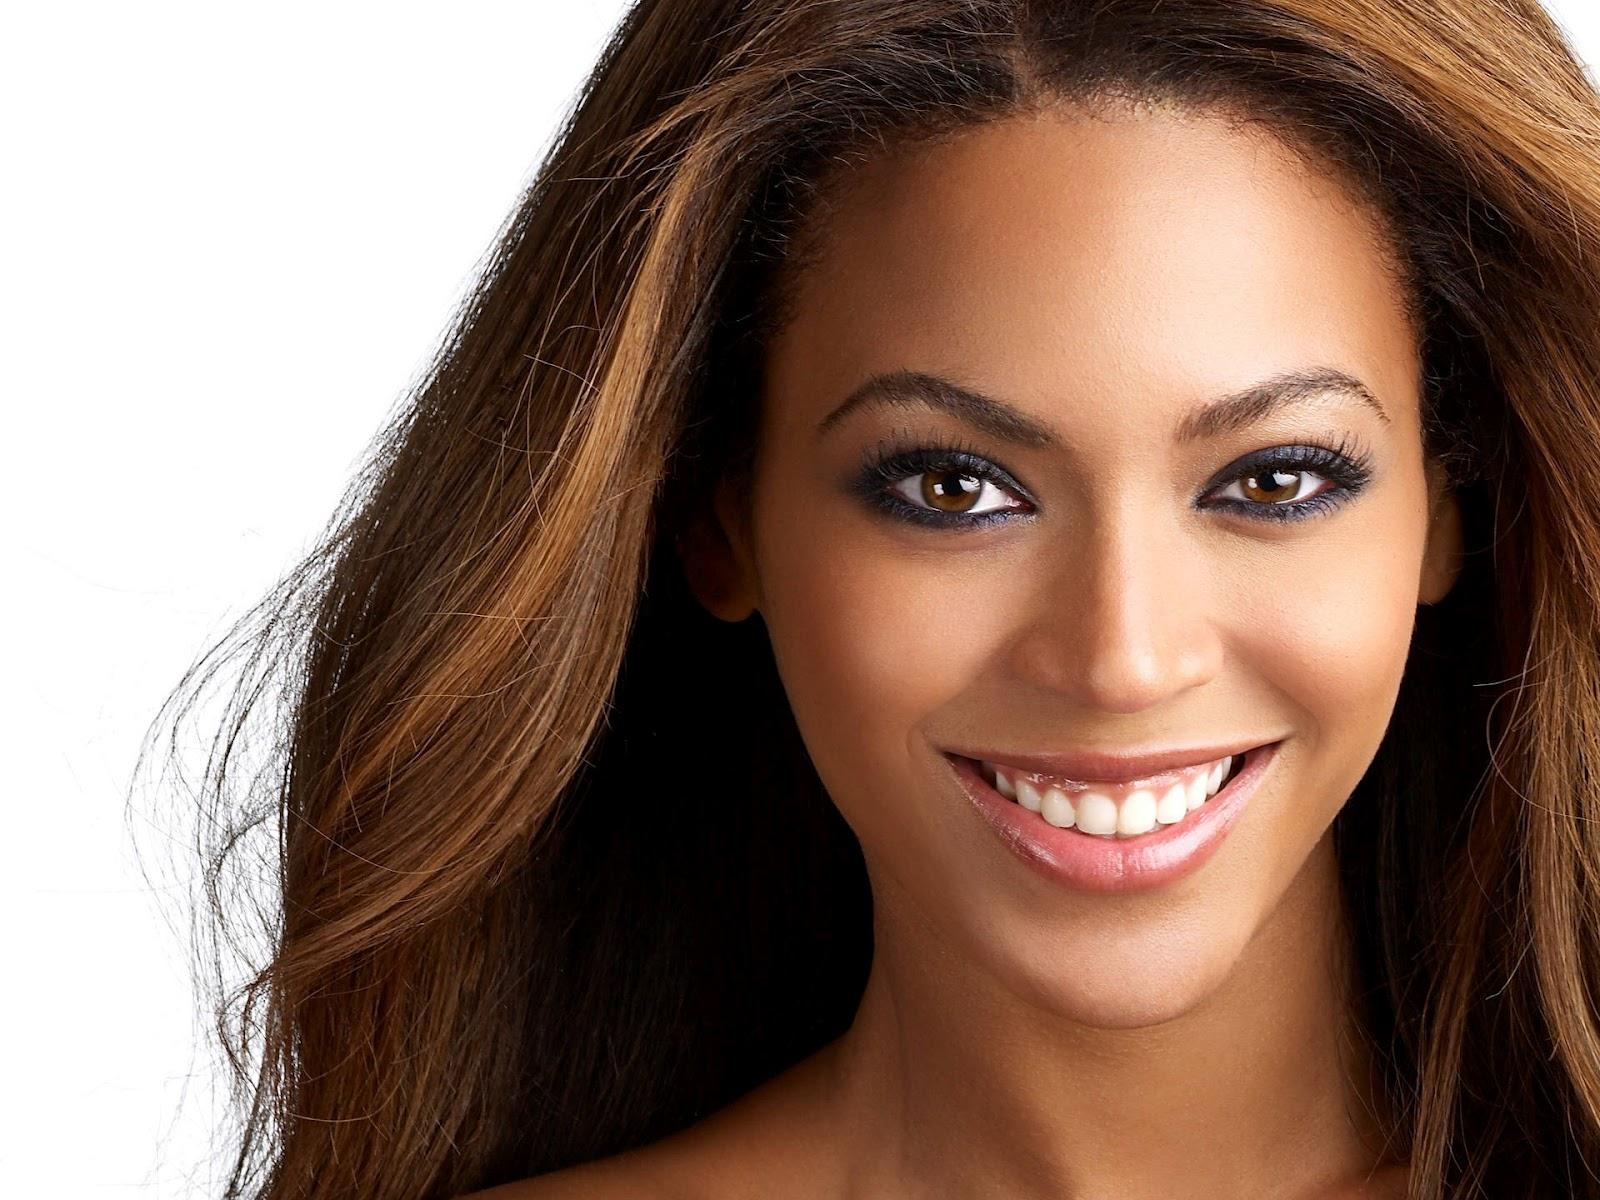 http://3.bp.blogspot.com/-z93dANt8y3Q/T1olhjDGDcI/AAAAAAAACAk/phcPttpEHBA/s1600/Beyonce-hot-piccol+(3).jpg